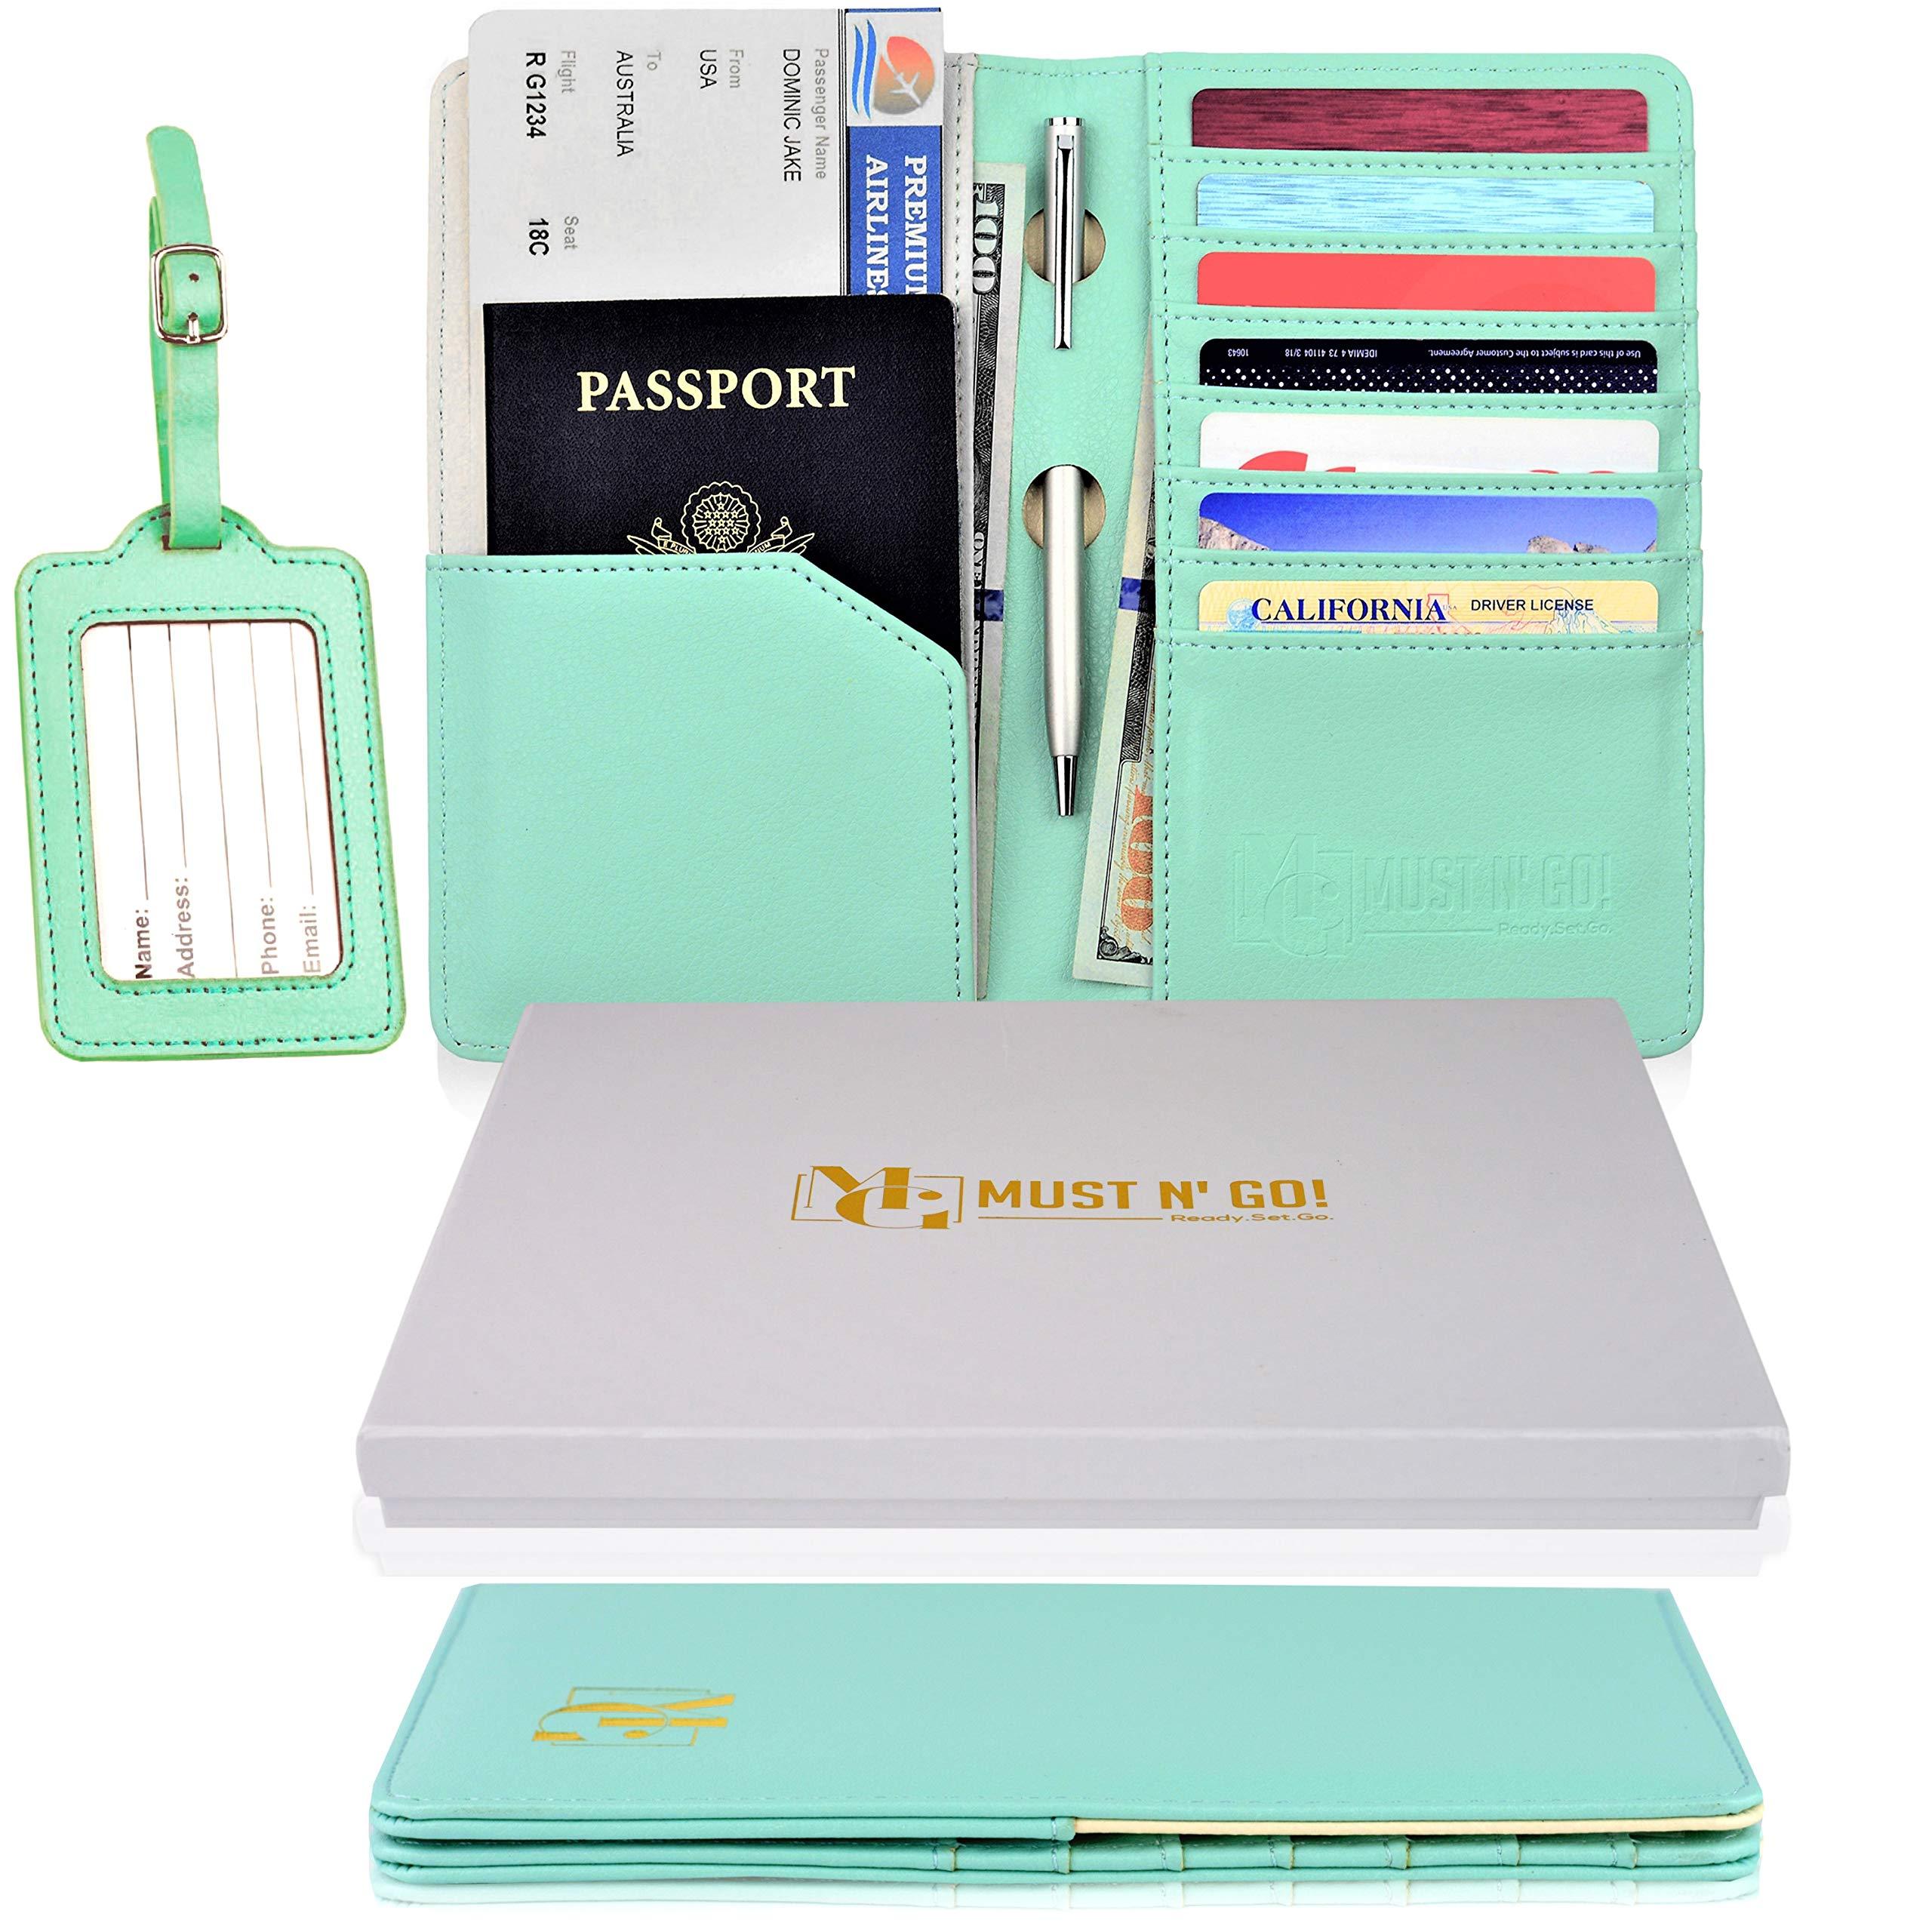 MUST N' GO! RFID Passport Holder for Women - Travel Passport Wallet RFID Blocking and Luggage Tag Set - Elegant Gift Box - Sky Green